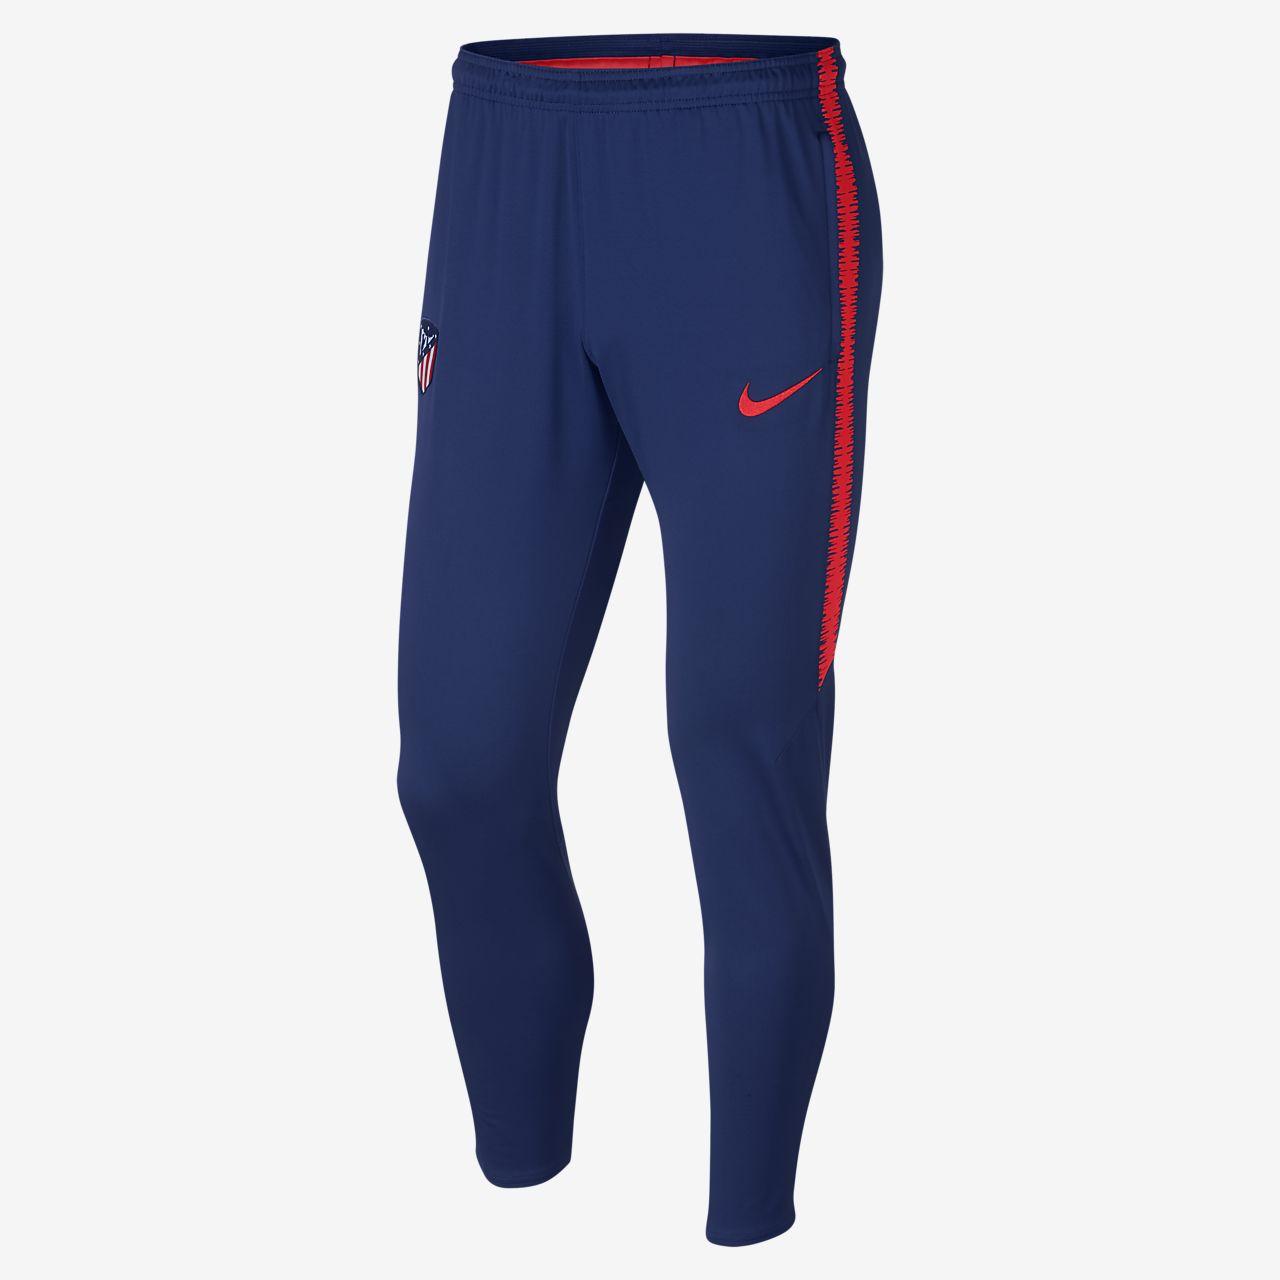 Pantalones de fútbol para hombre Atlético de Madrid Dri-FIT Squad ... 0e01911638eb6